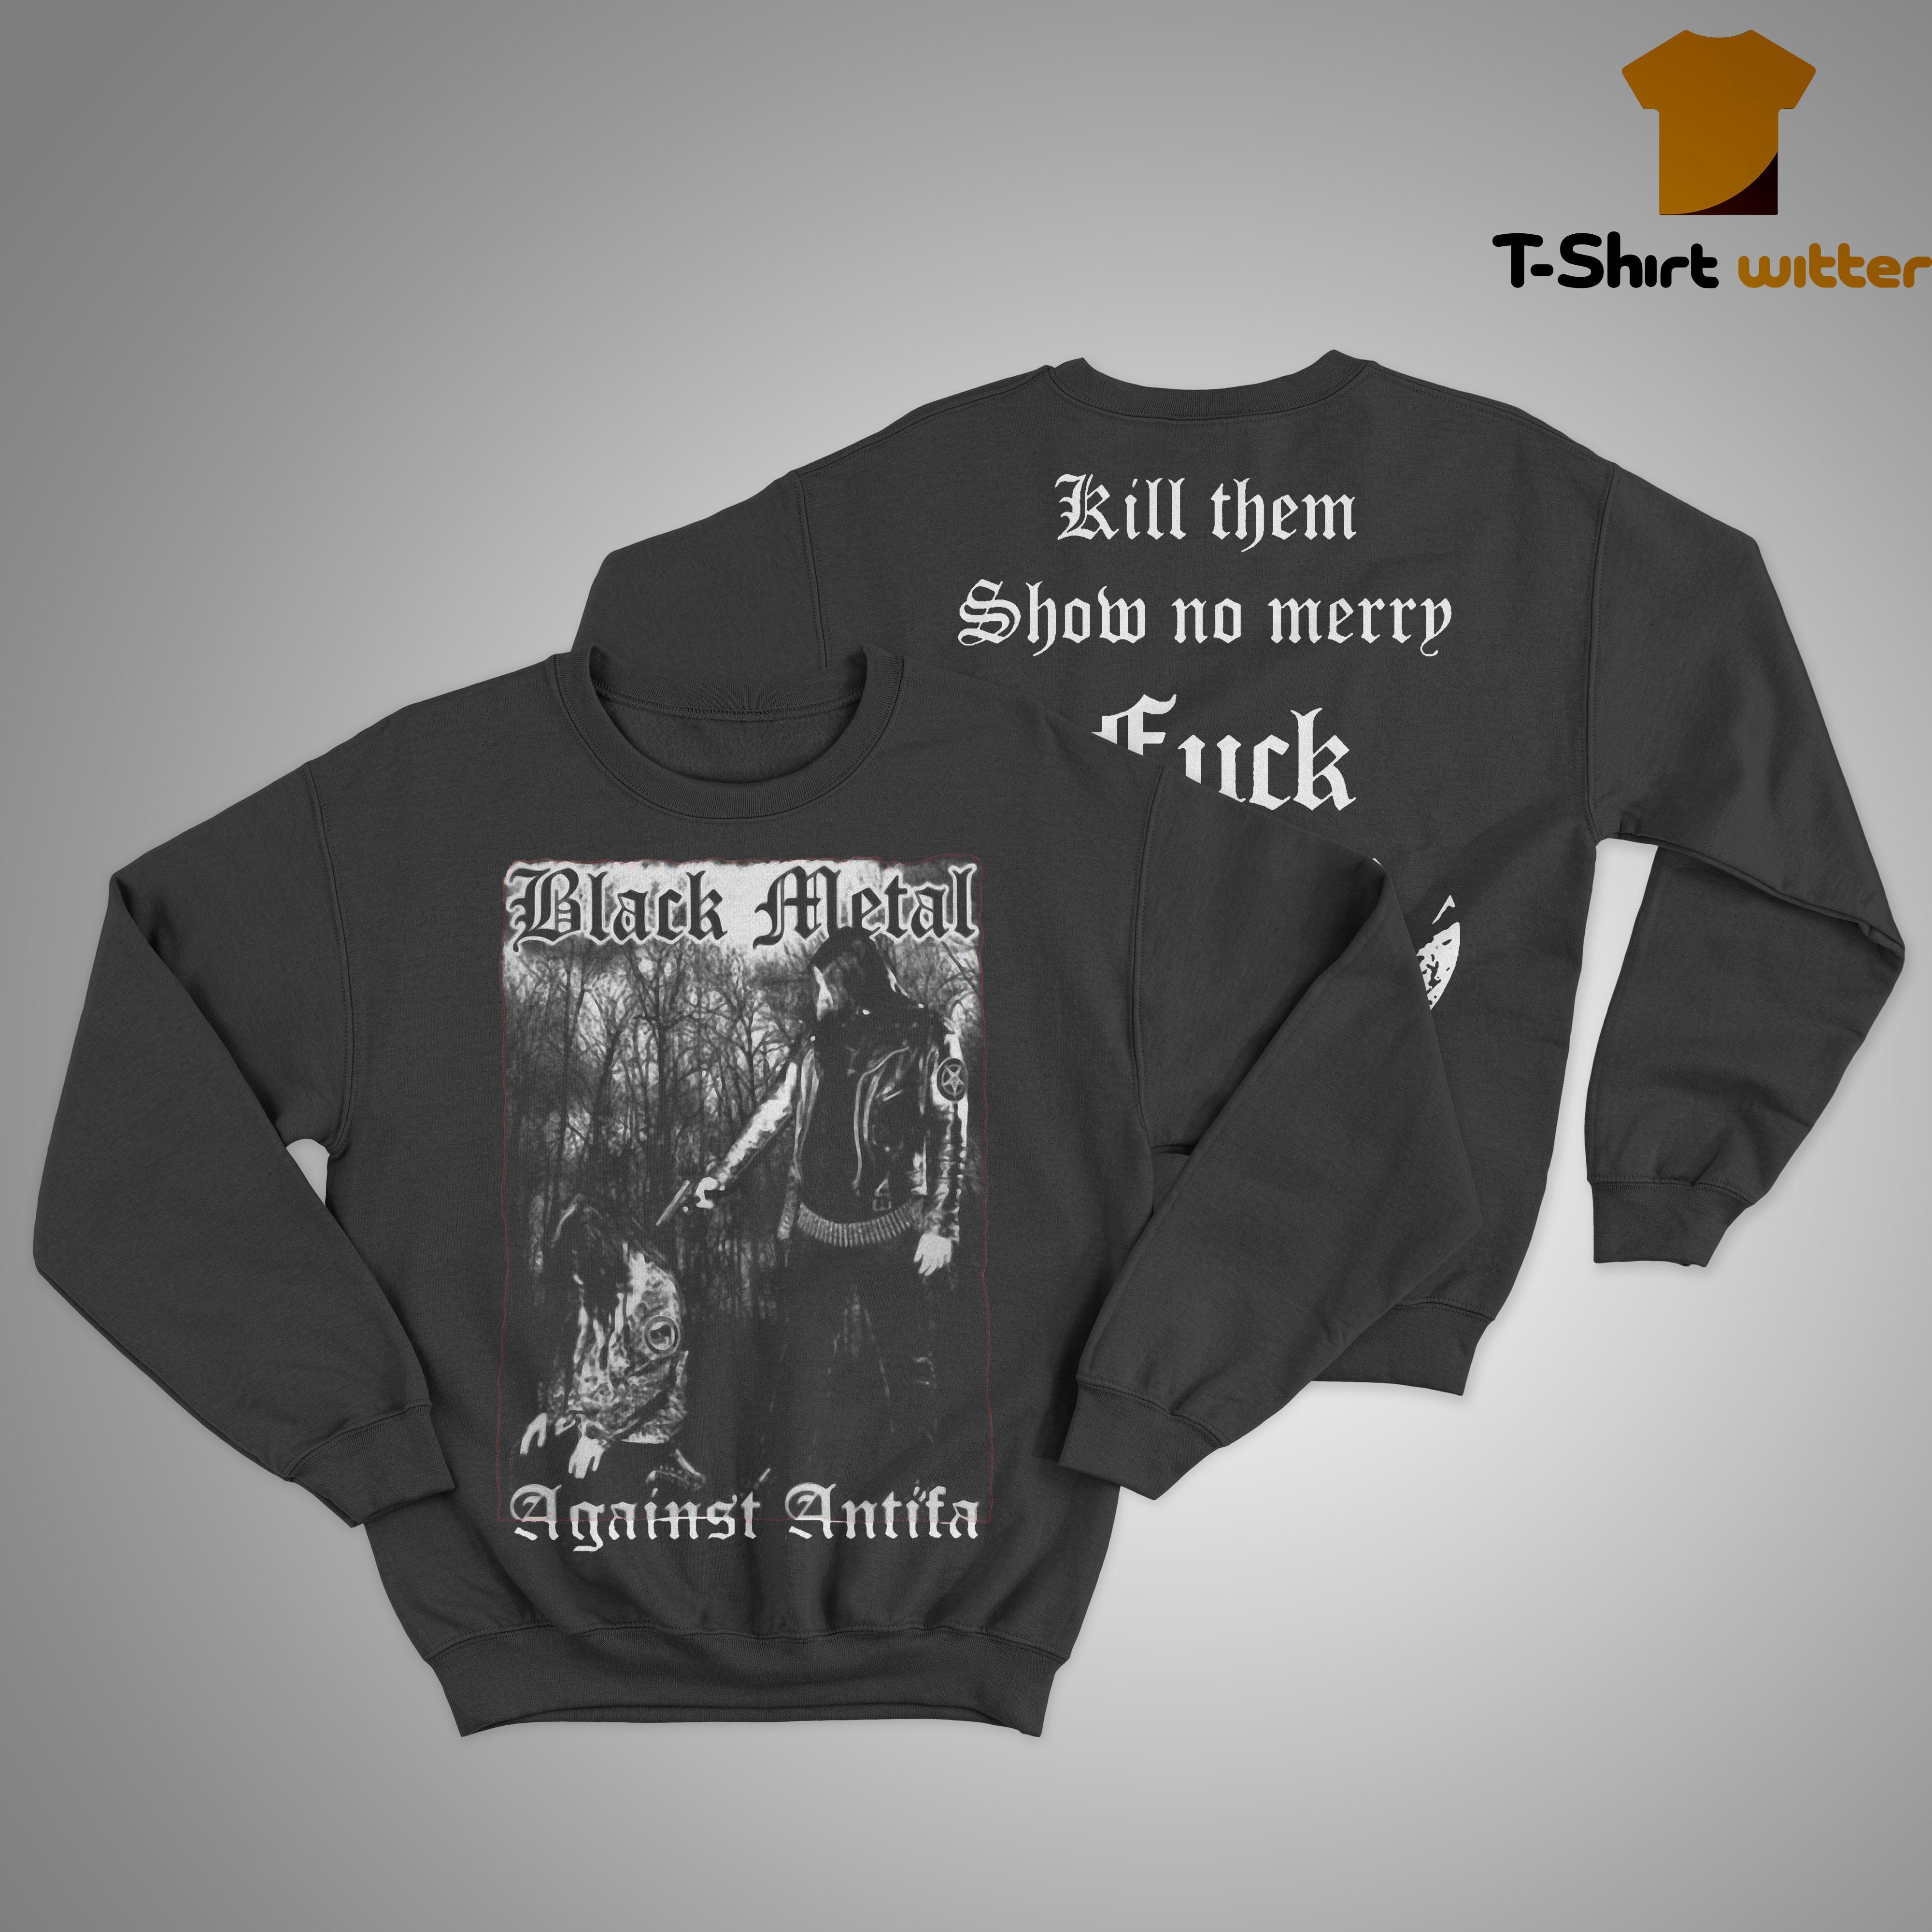 Behemoth Frontman Black Metal Against Antifa Sweater